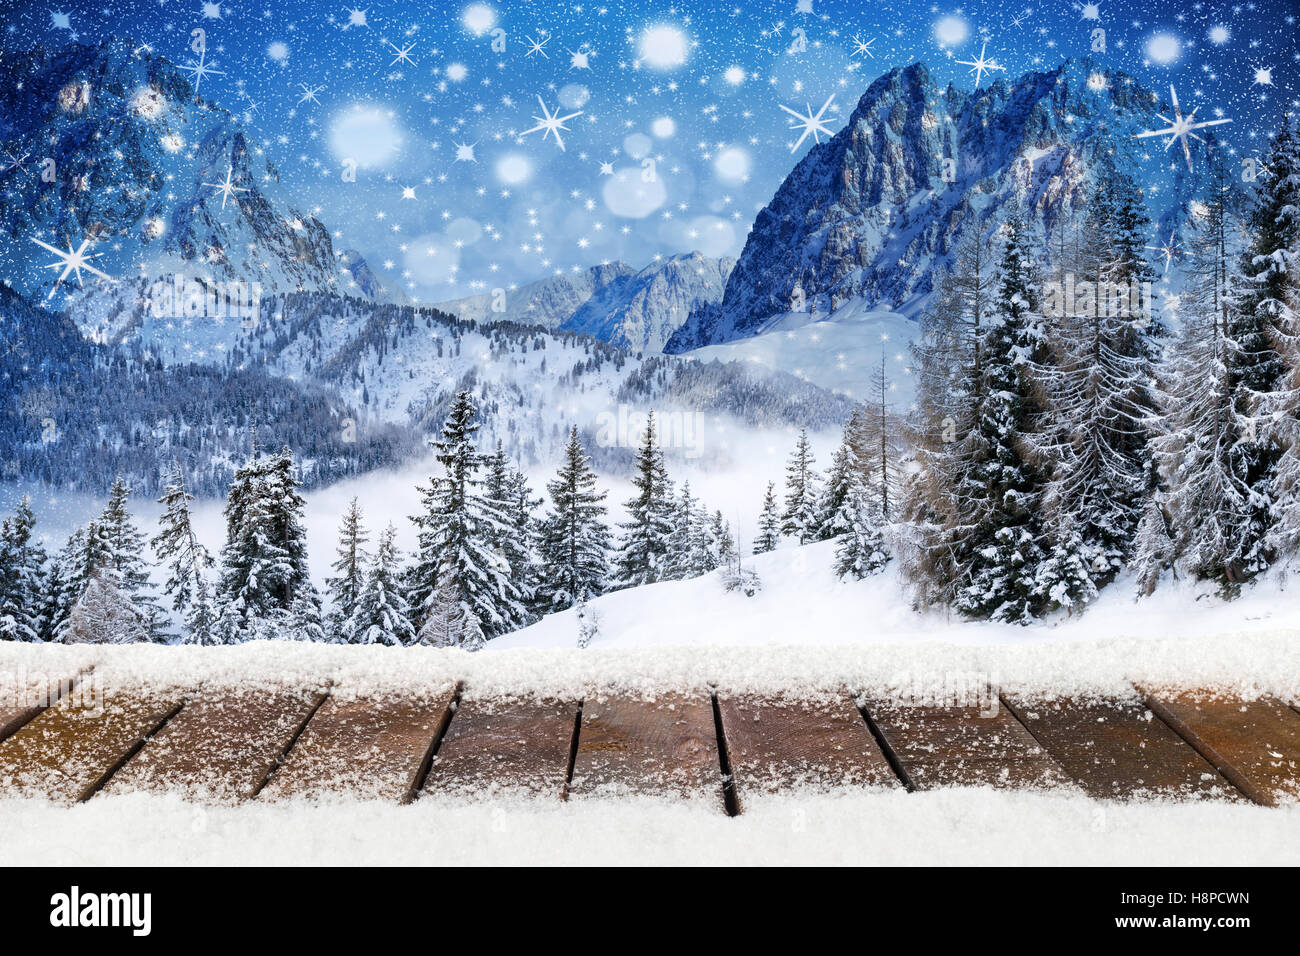 Mountain Christmas Tree